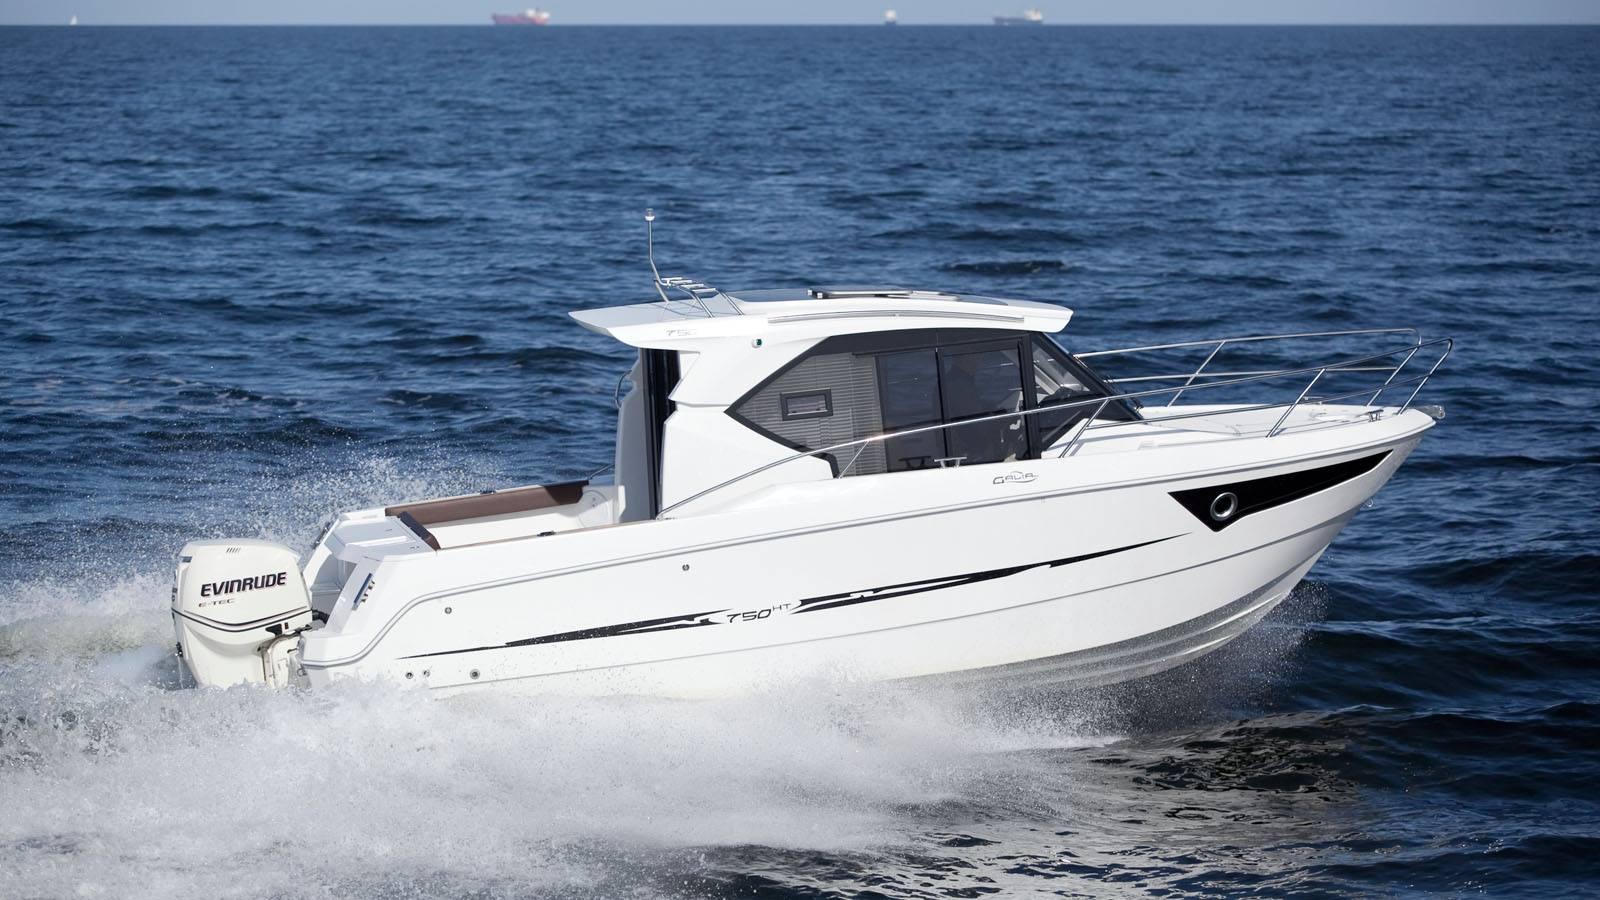 Galia 750 HT